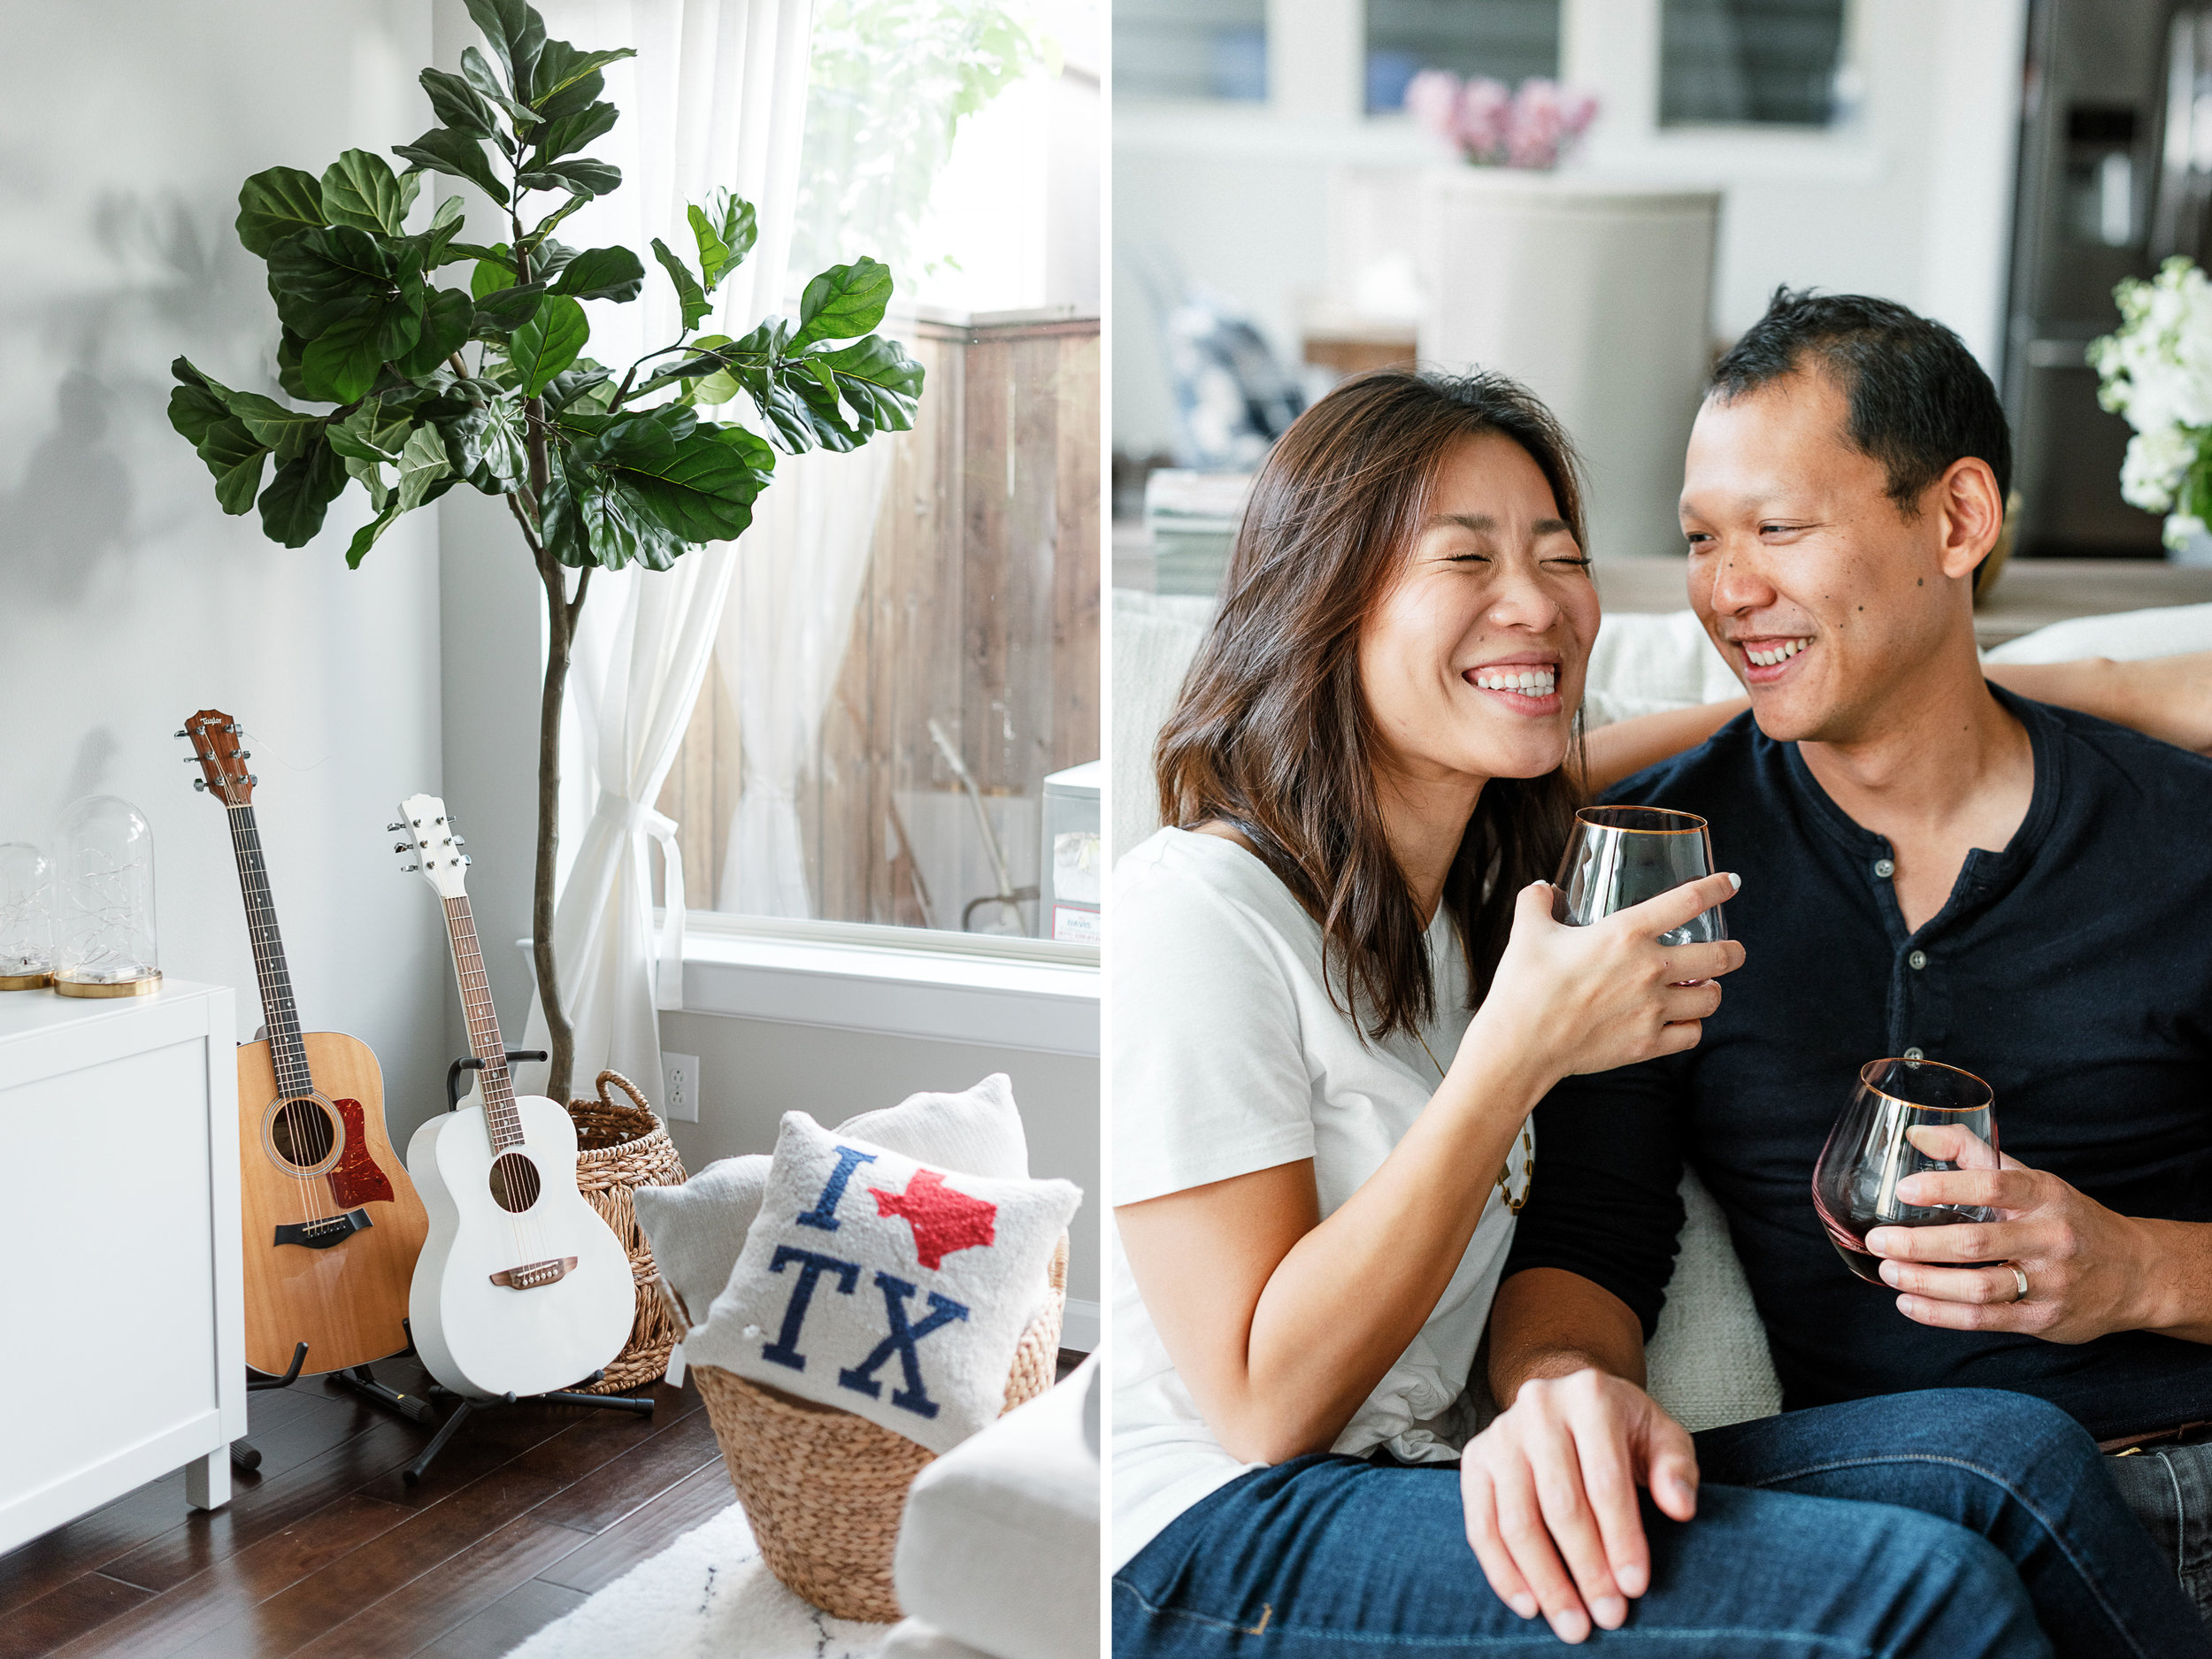 Houston-Wedding-Photographer-Best-Top-Luxury-Destination-Engagements-Portrait-Austin-Photography-111.jpg